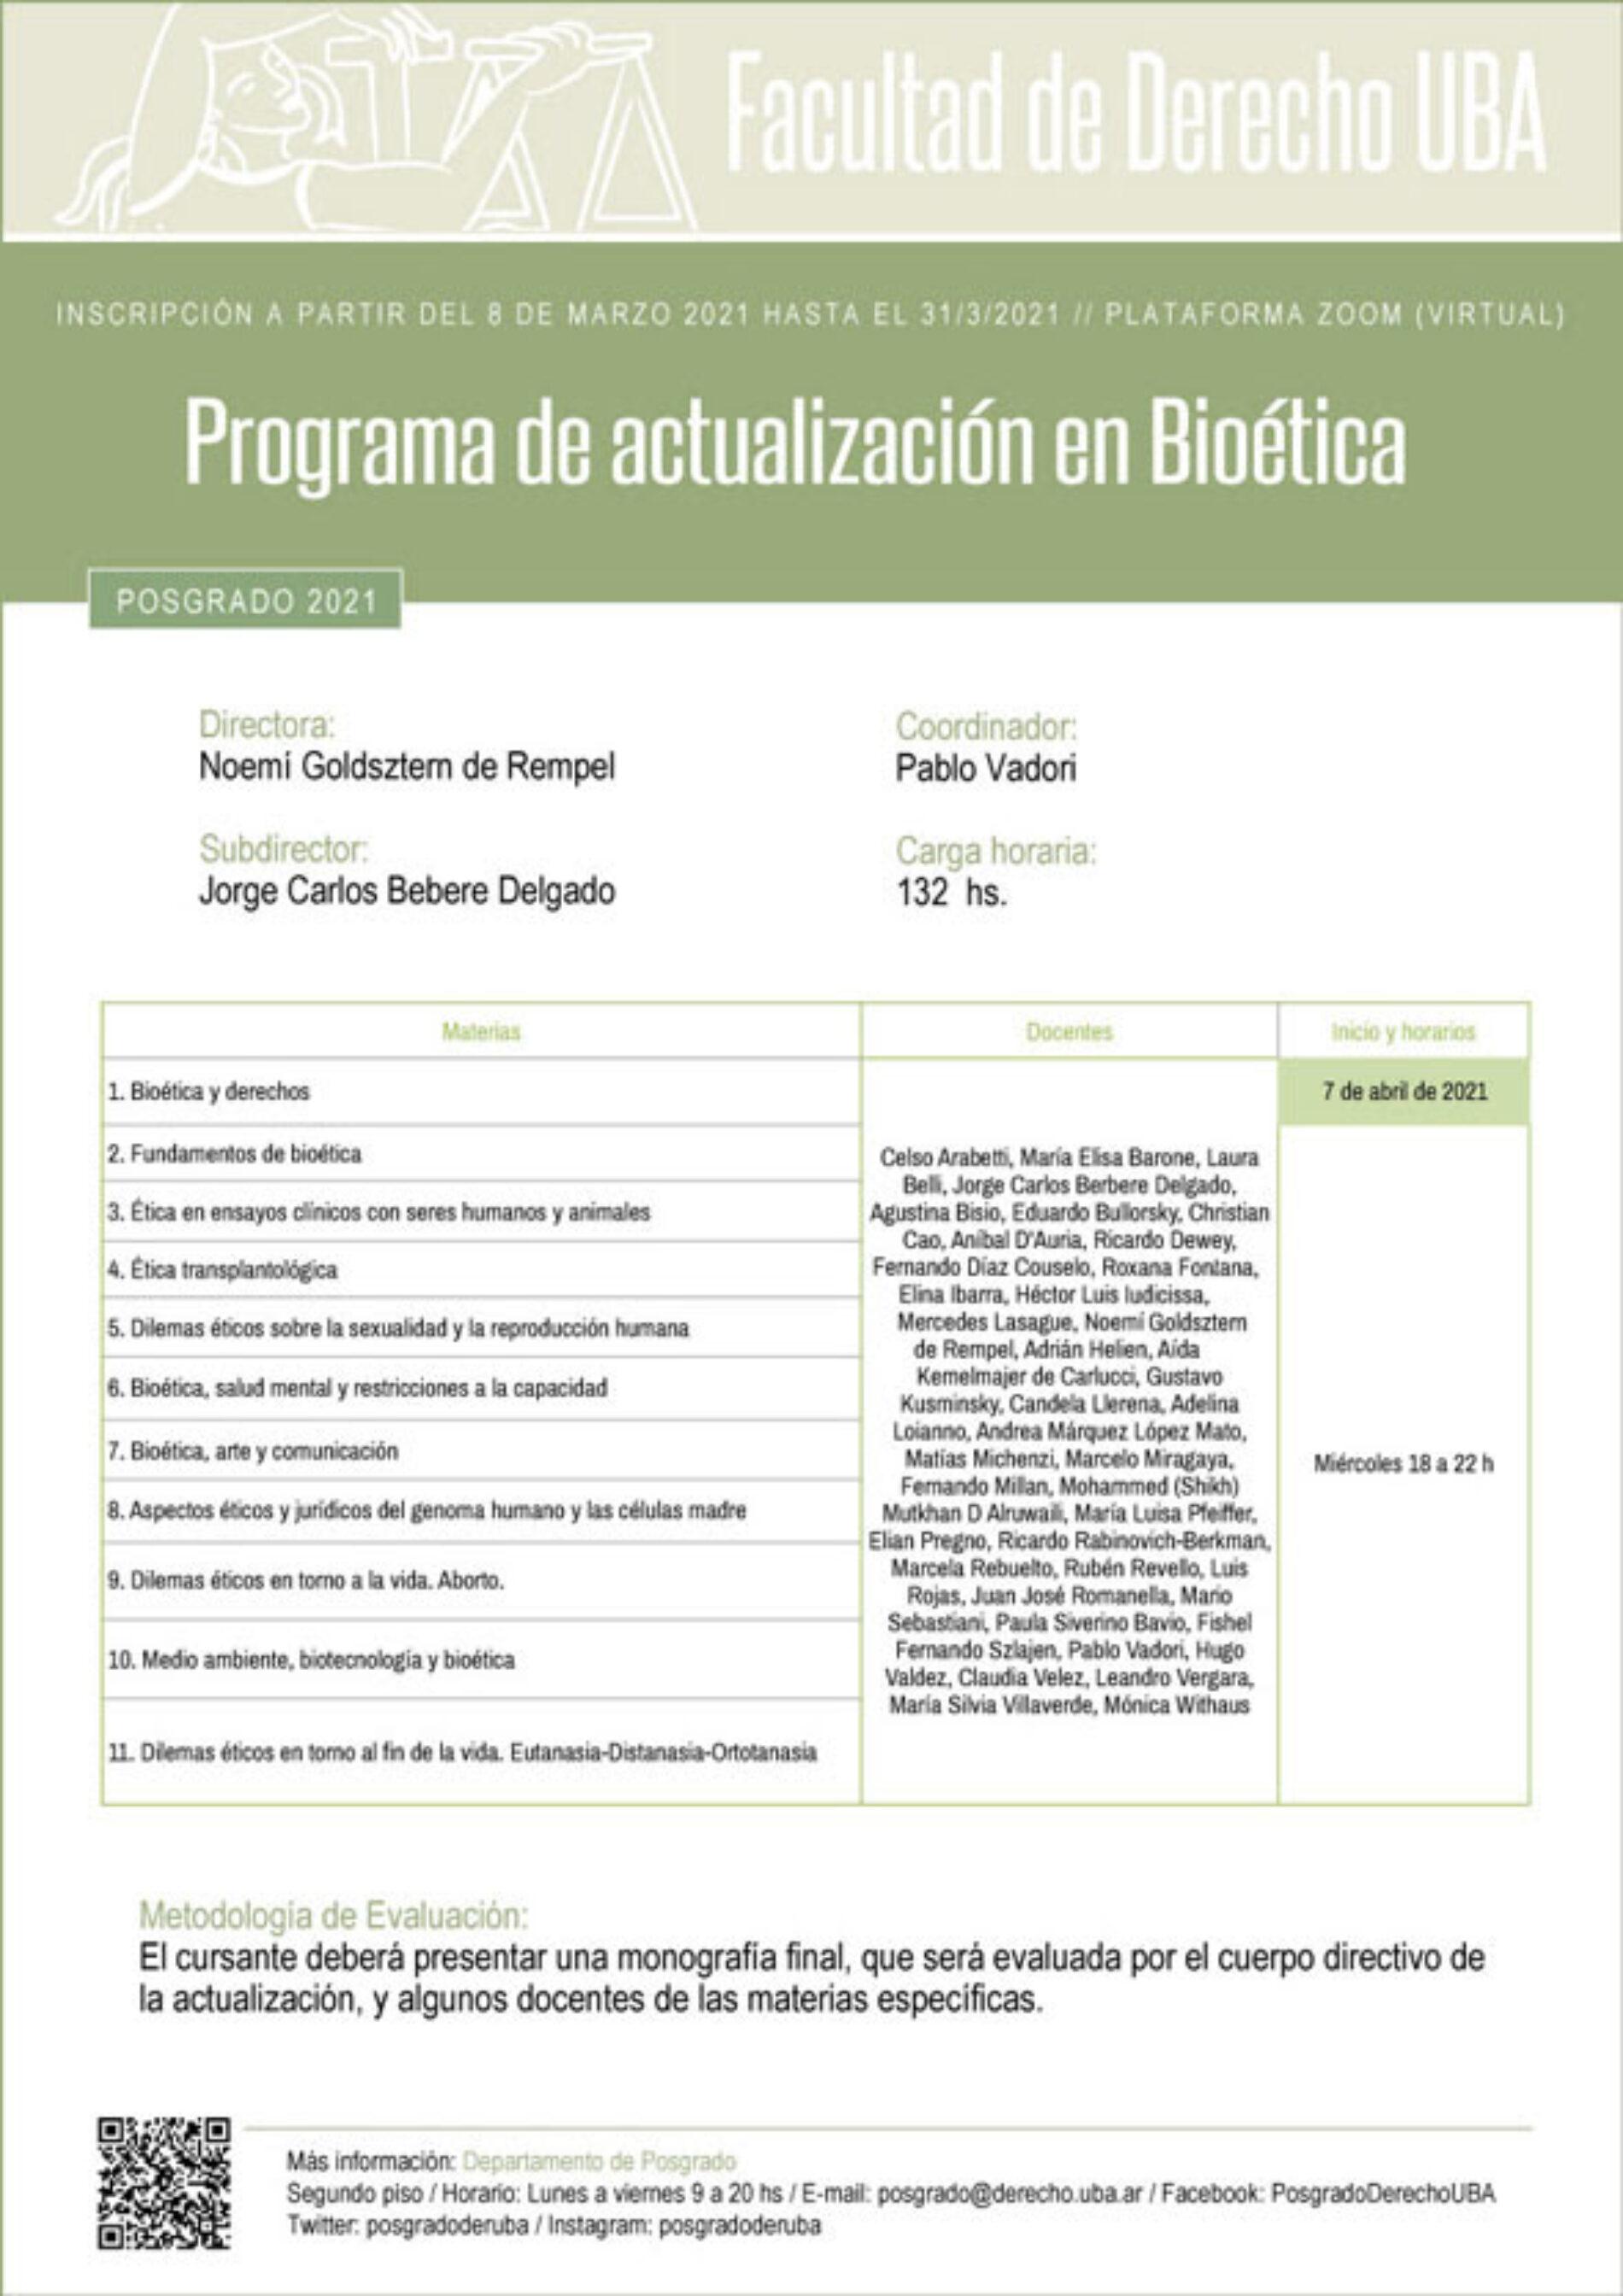 Programa de actualización en Bioética